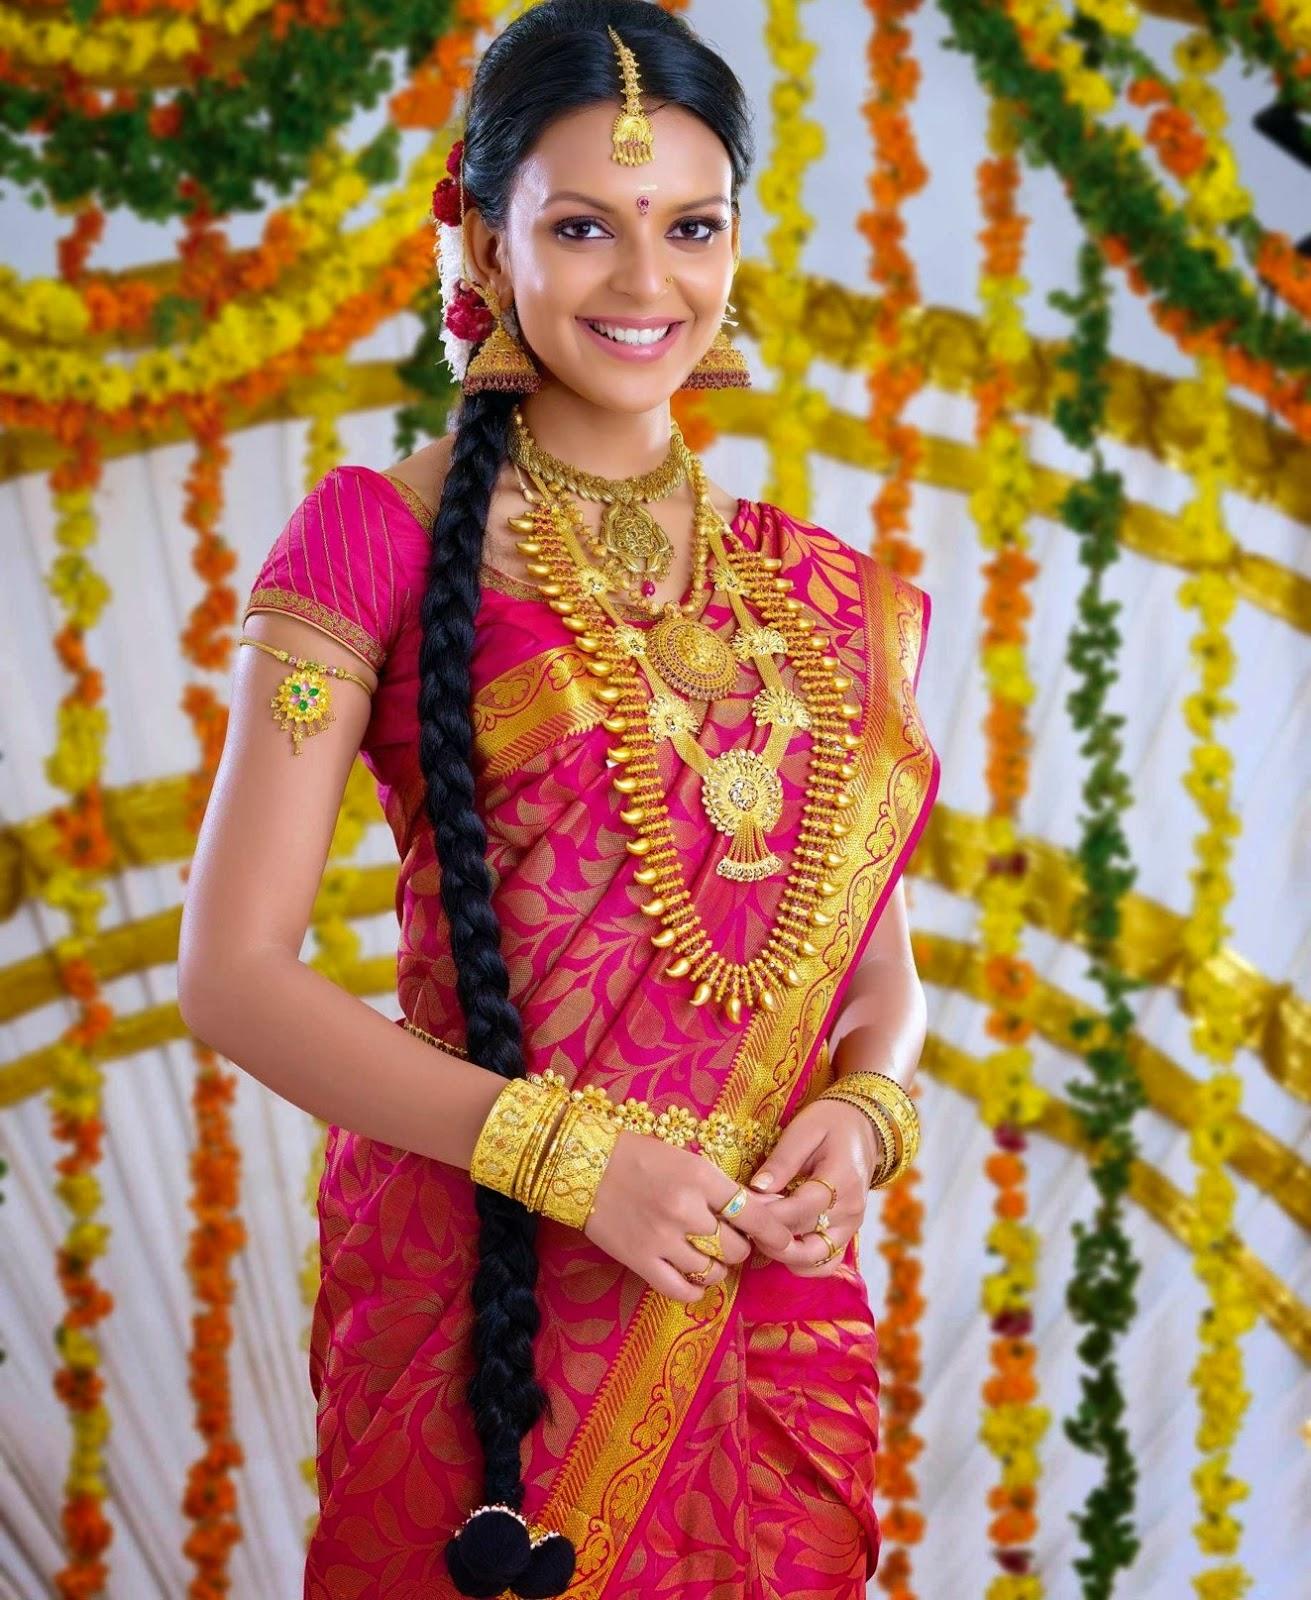 South Indian Bridal Wedding Jewelry 2014 - 2015 HD ...